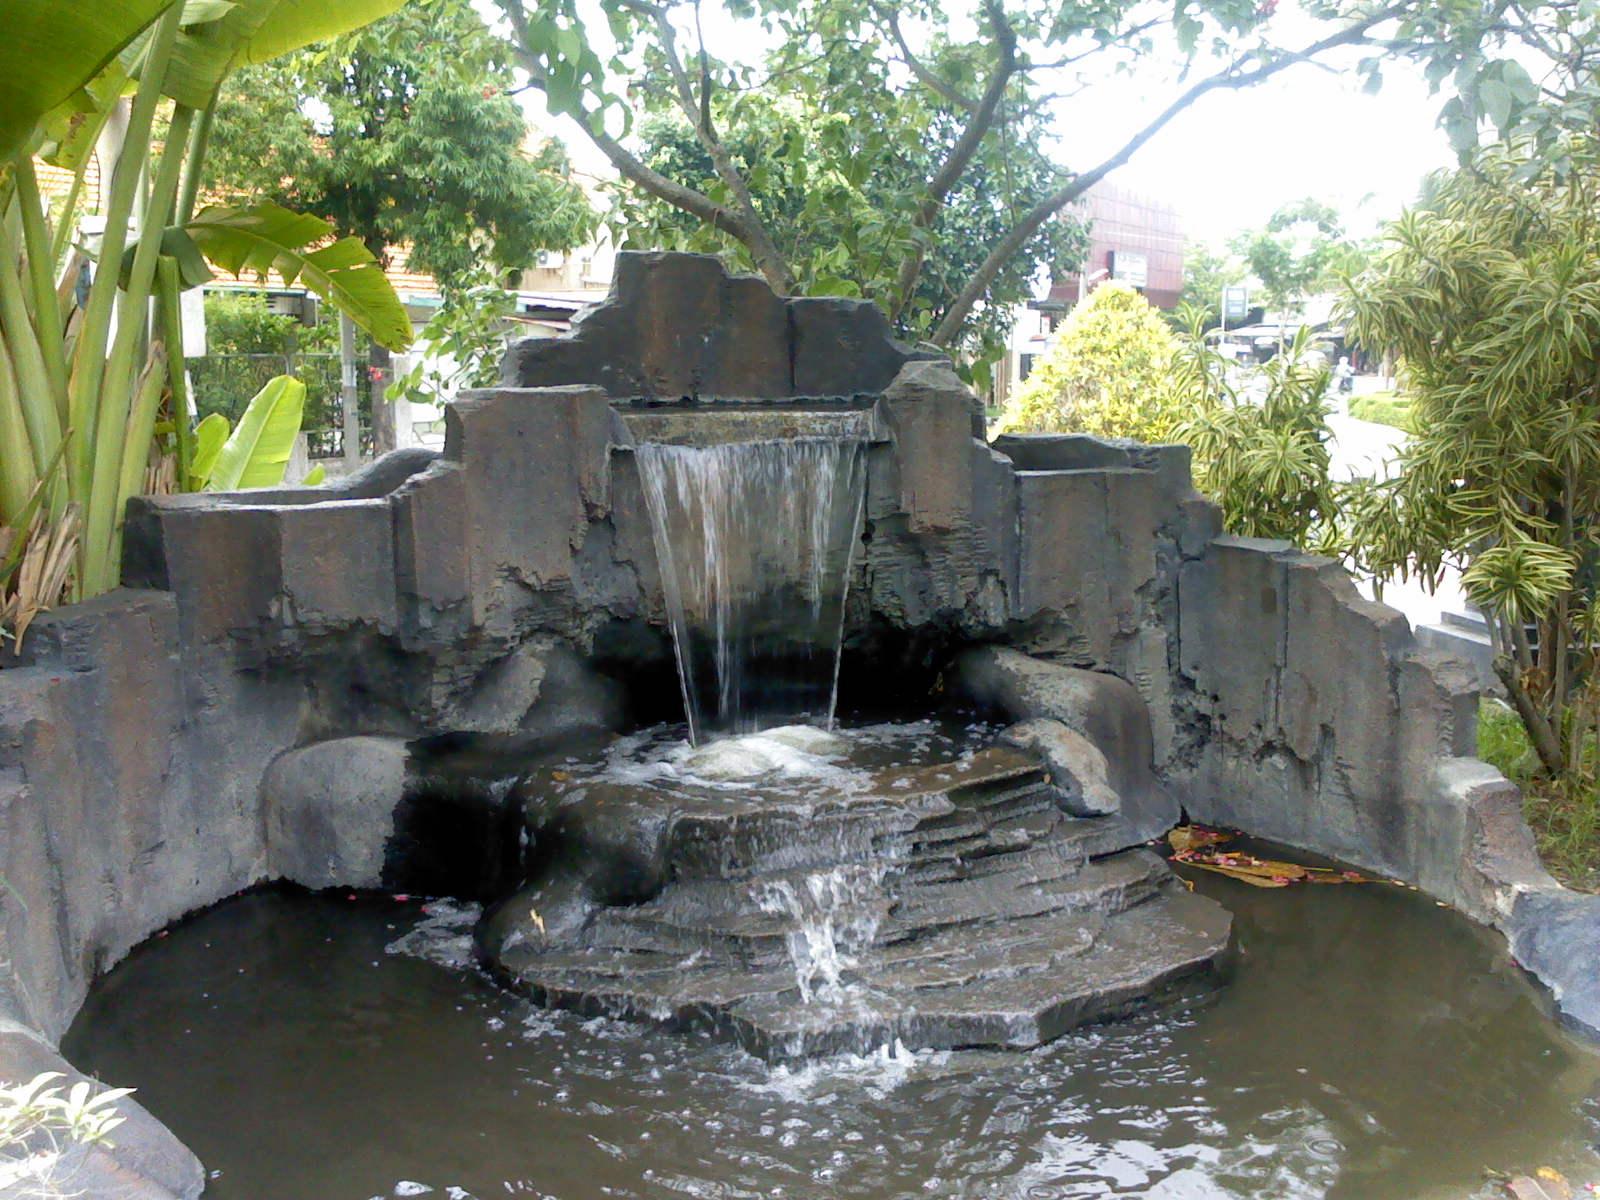 Taman Kota Surabaya Pesona Miniatur Air Terjun Terletak Persahabatan Dr